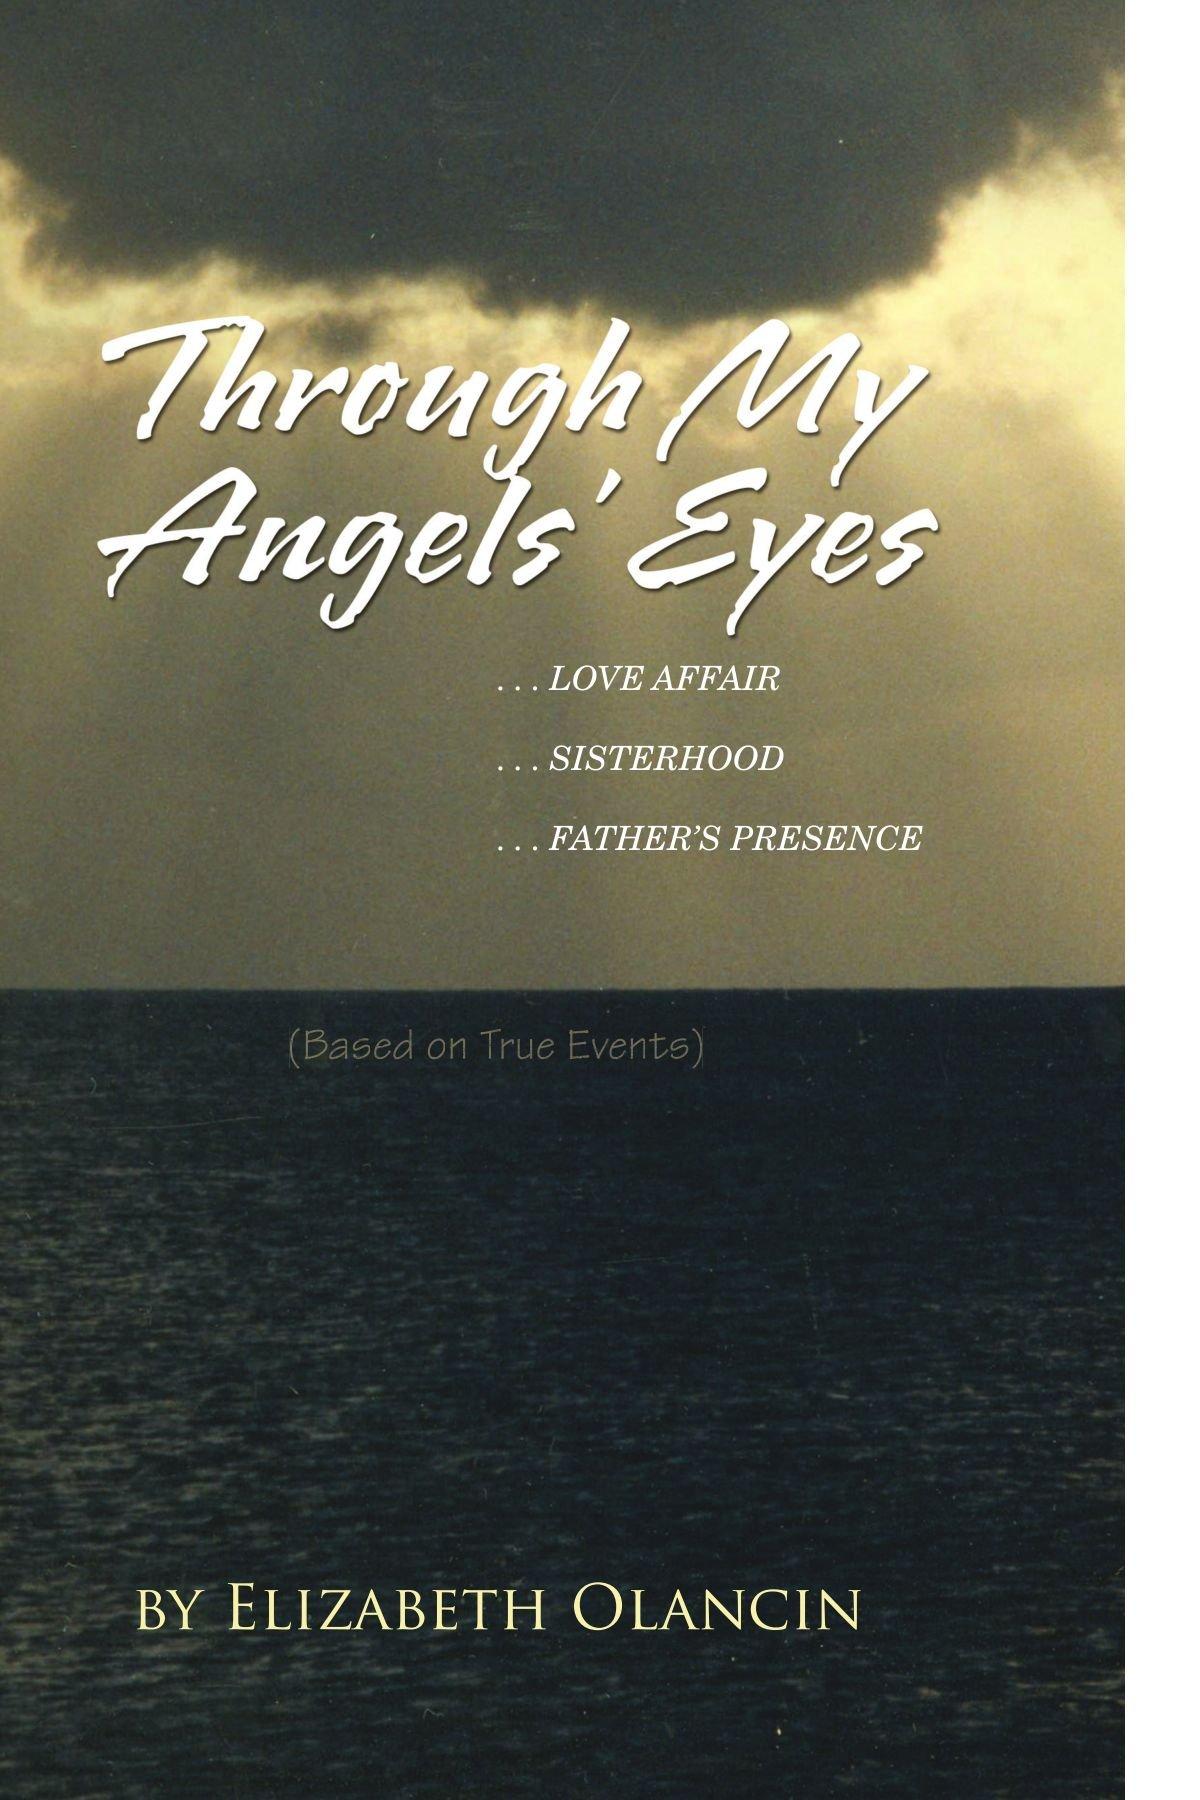 Through My Angels' Eyes: ...Love Affair...Sisterhood...Father's Presence  (Based on True Events) ebook